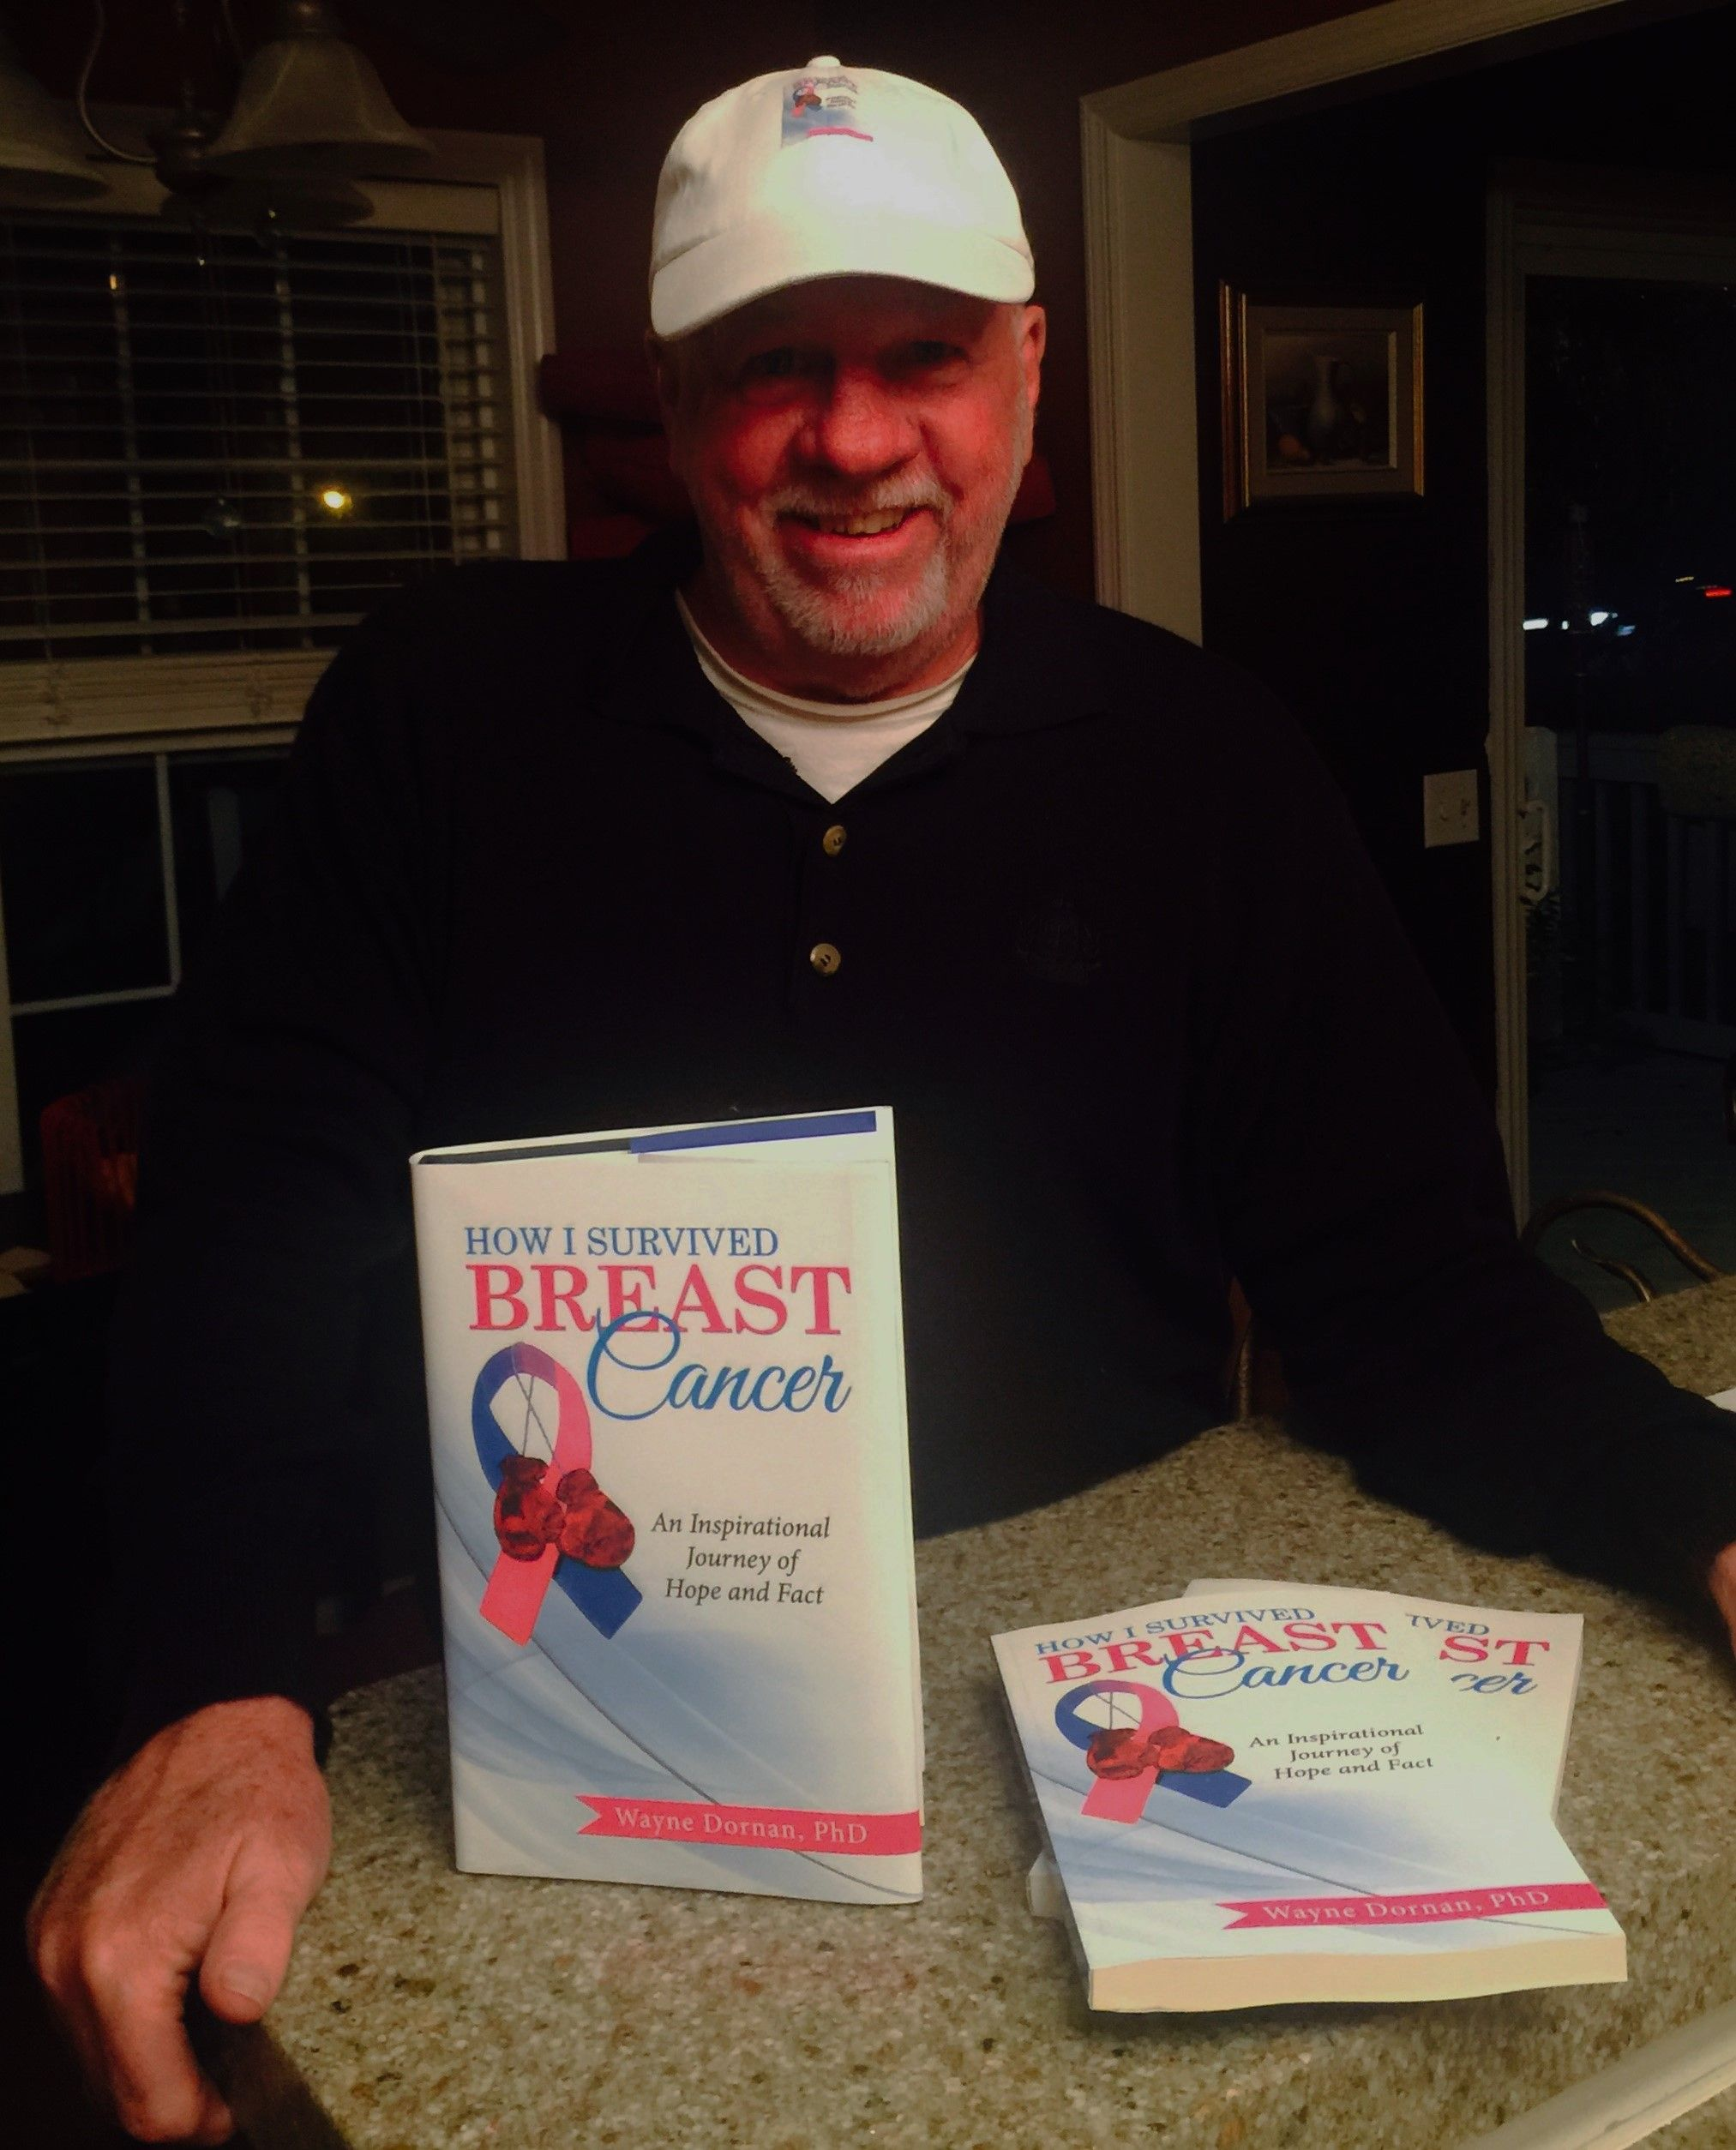 dating sites for breast cancer survivors